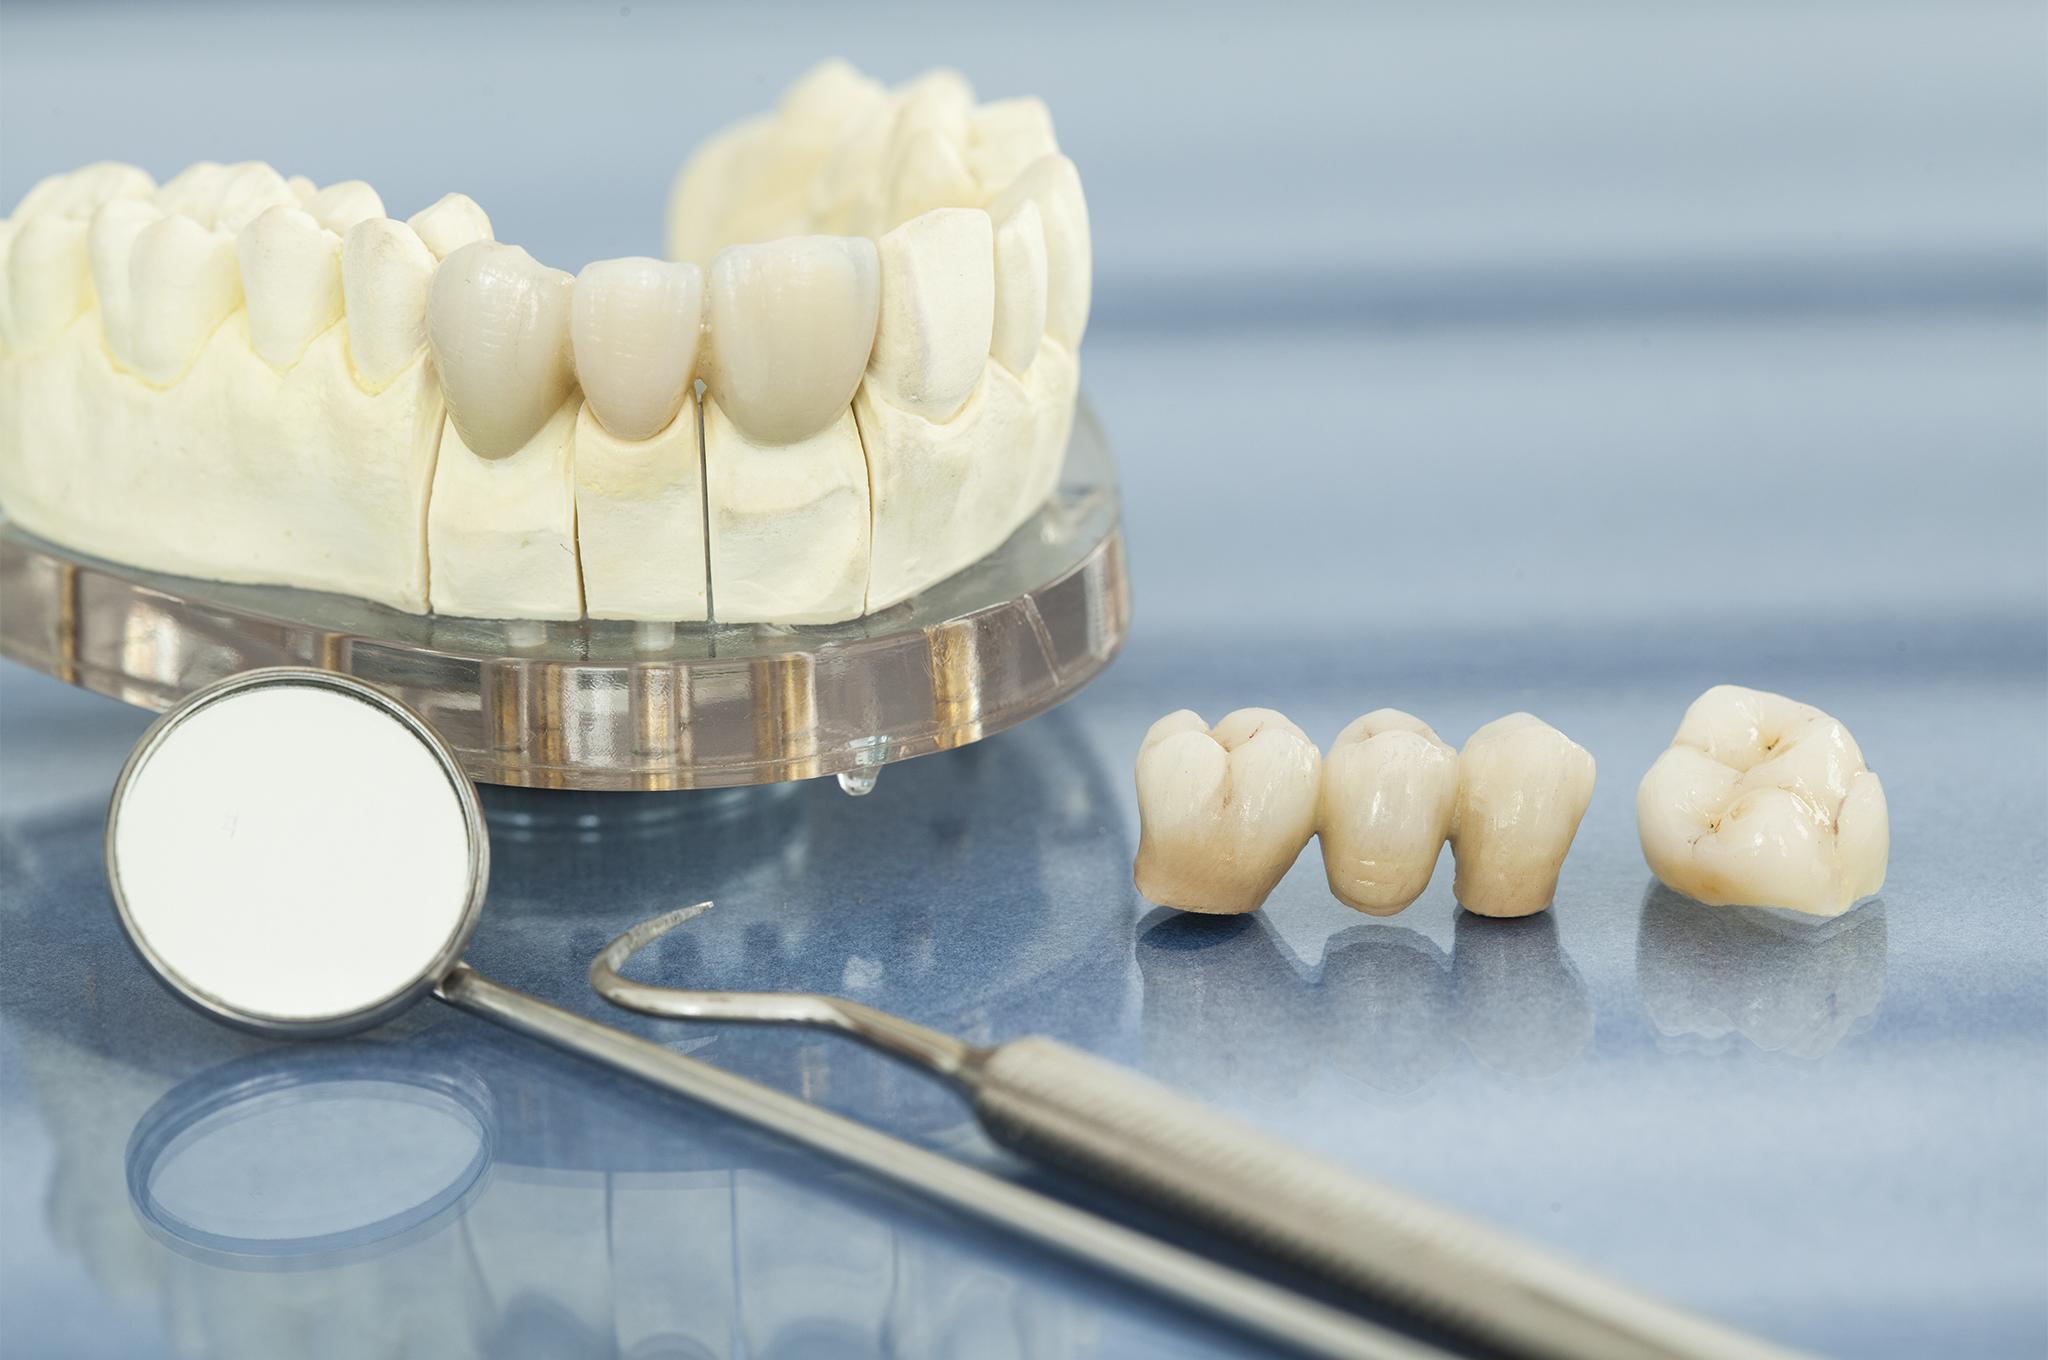 Restorative Work, Dental health care, Greenville Dentist, Cosmetic Dental, CCDS